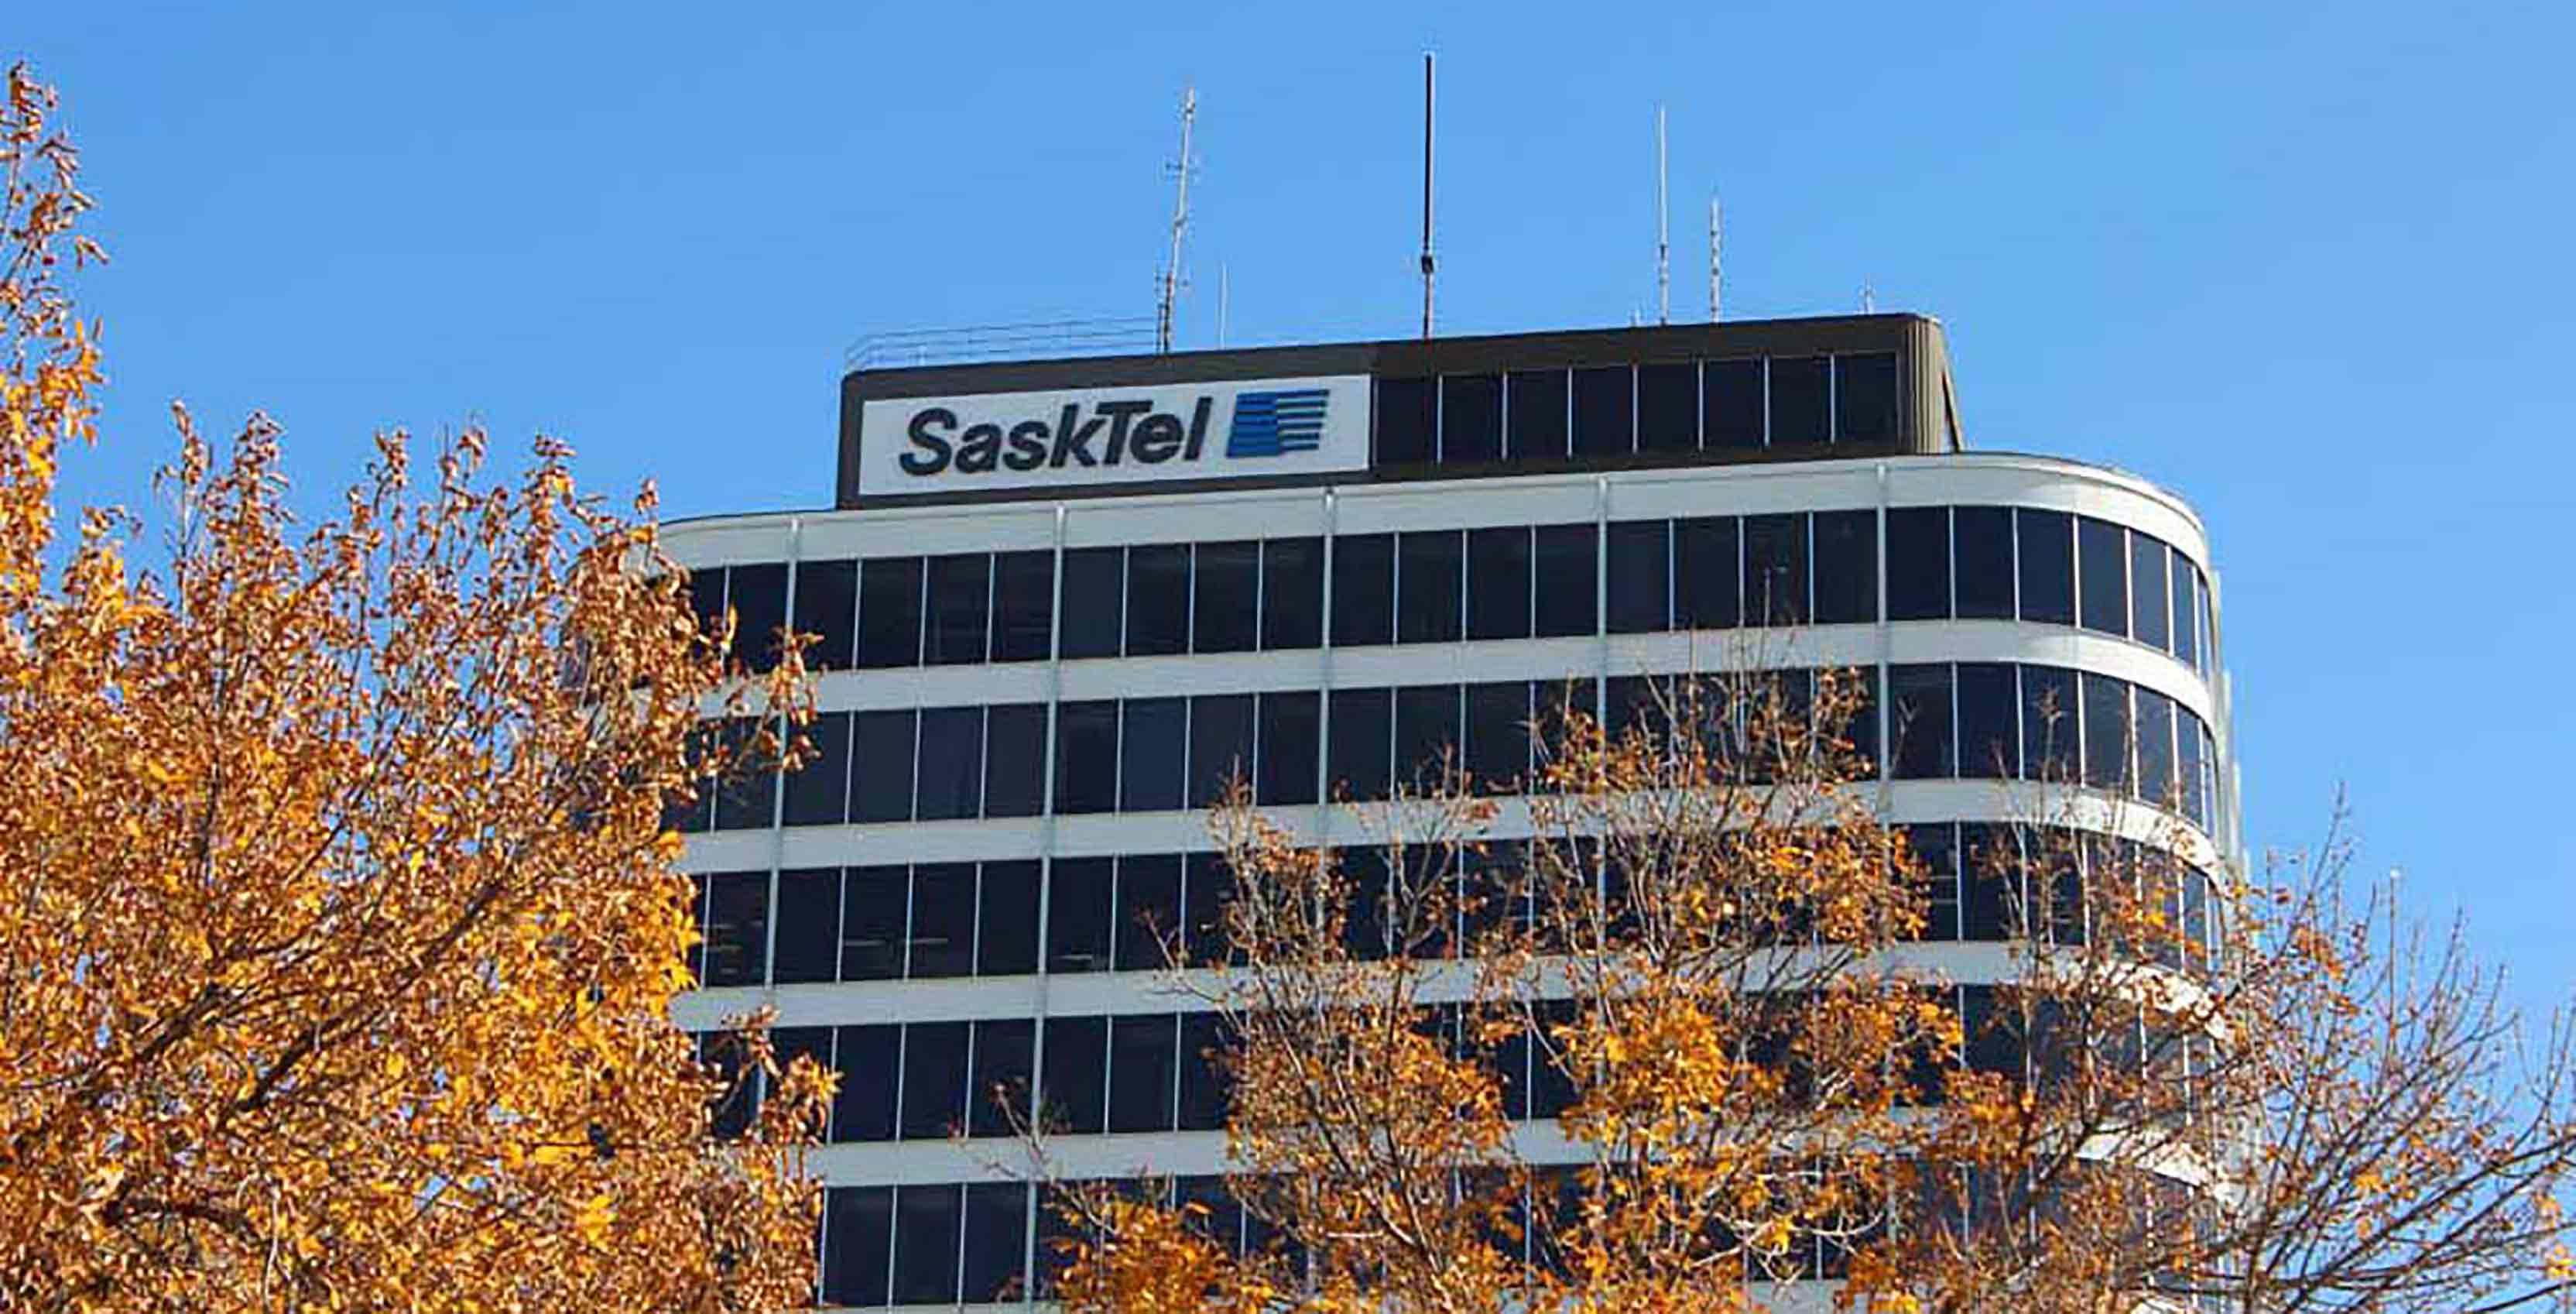 An image of SaskTel's Saskatchewan headquarters